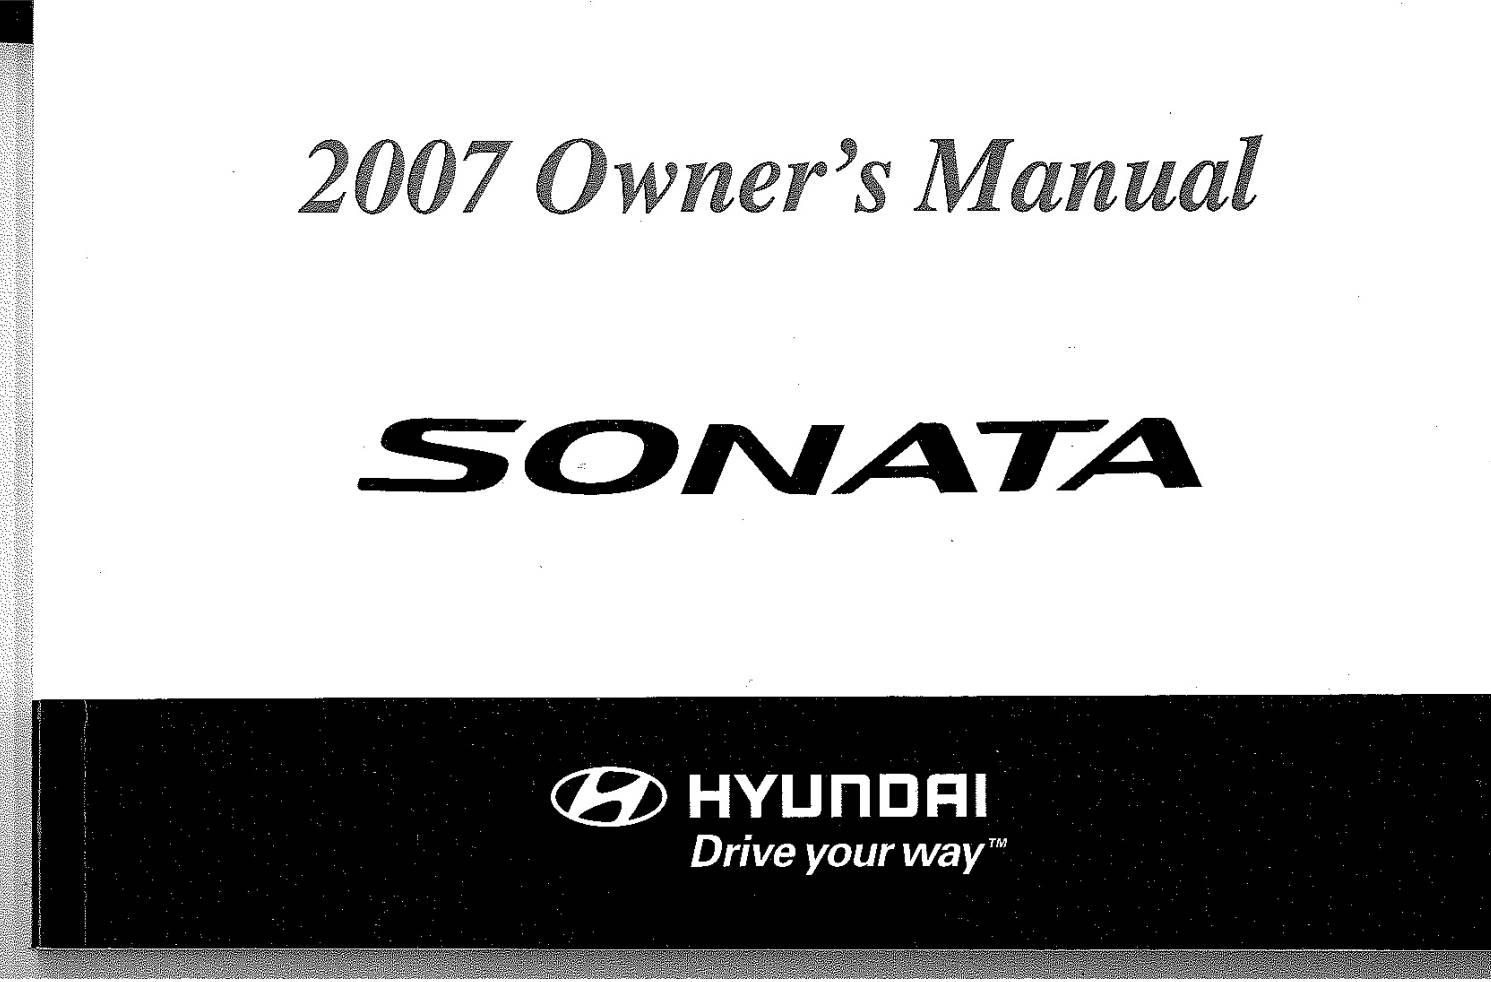 Hyundai Sonata 2007 Owner's Manual